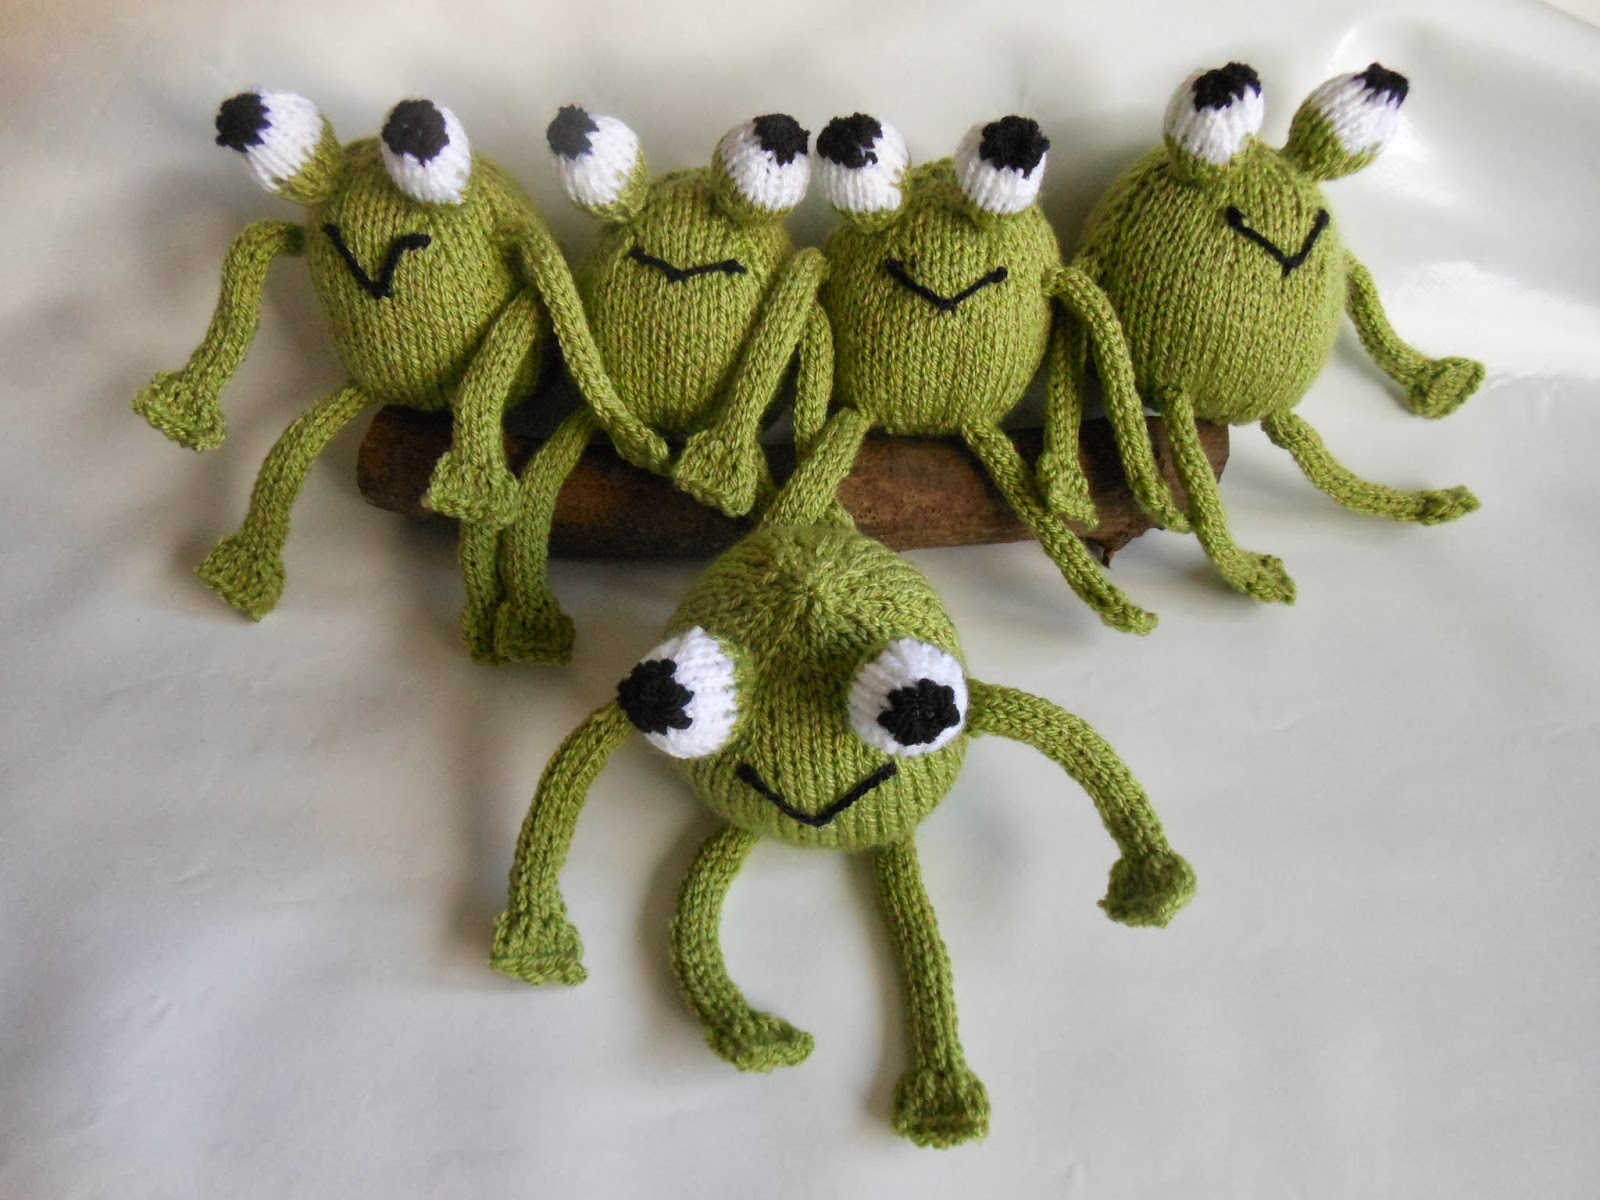 Clobelle: Five Little Speckled Frogs...